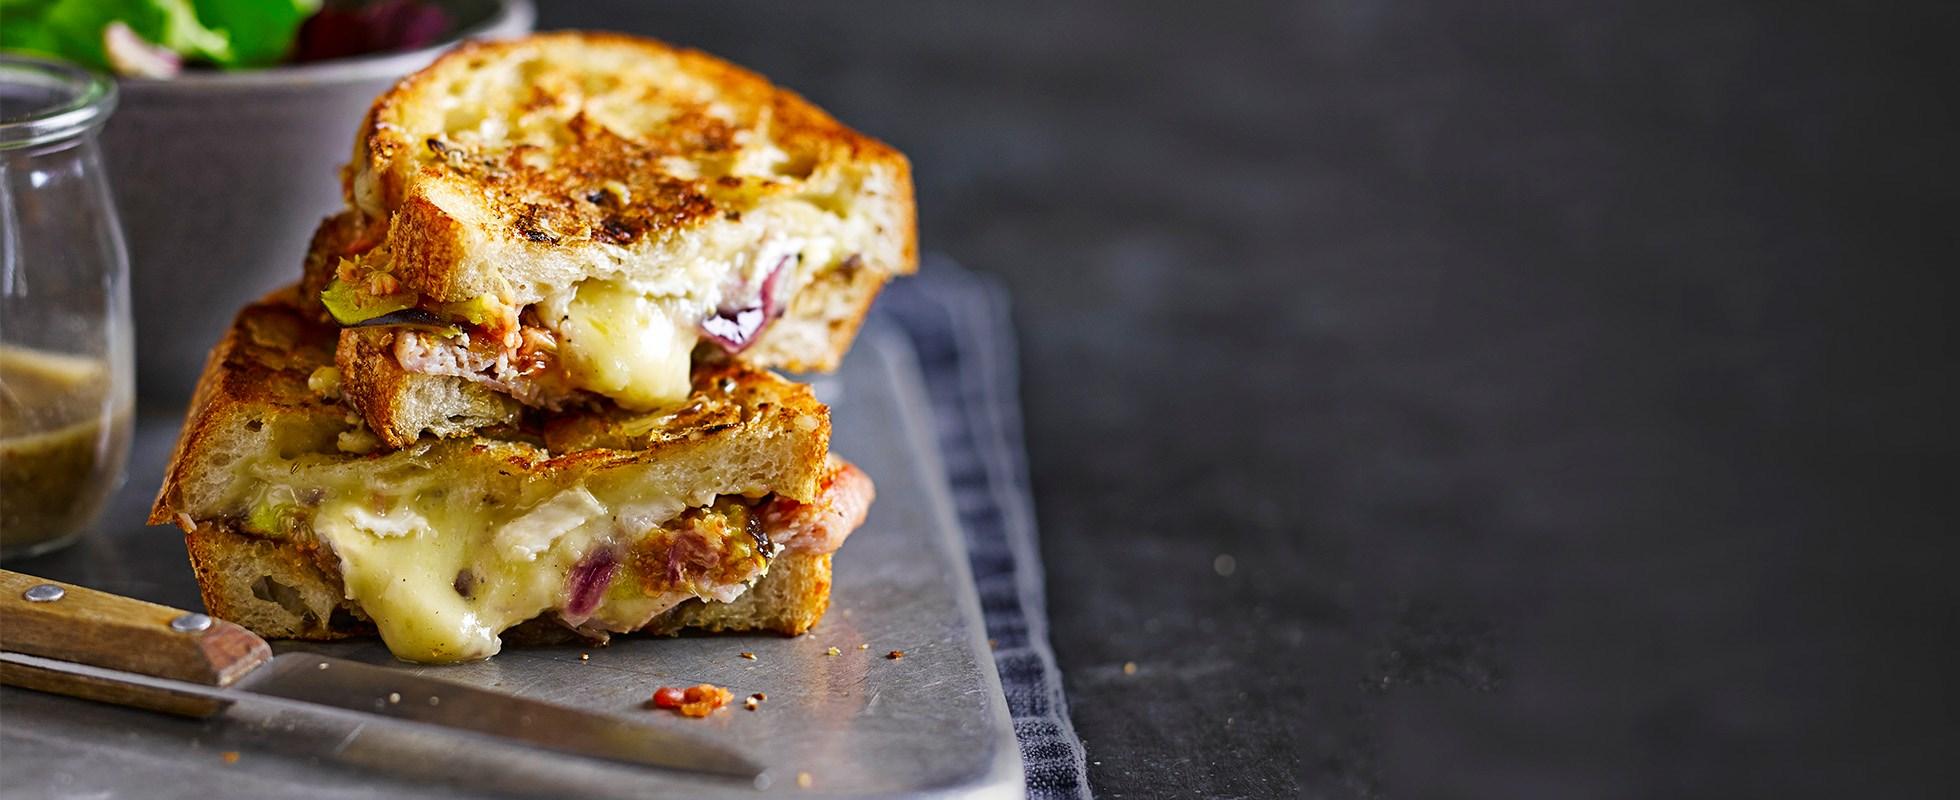 Top 10 Cheese Toastie Recipes - olive magazine